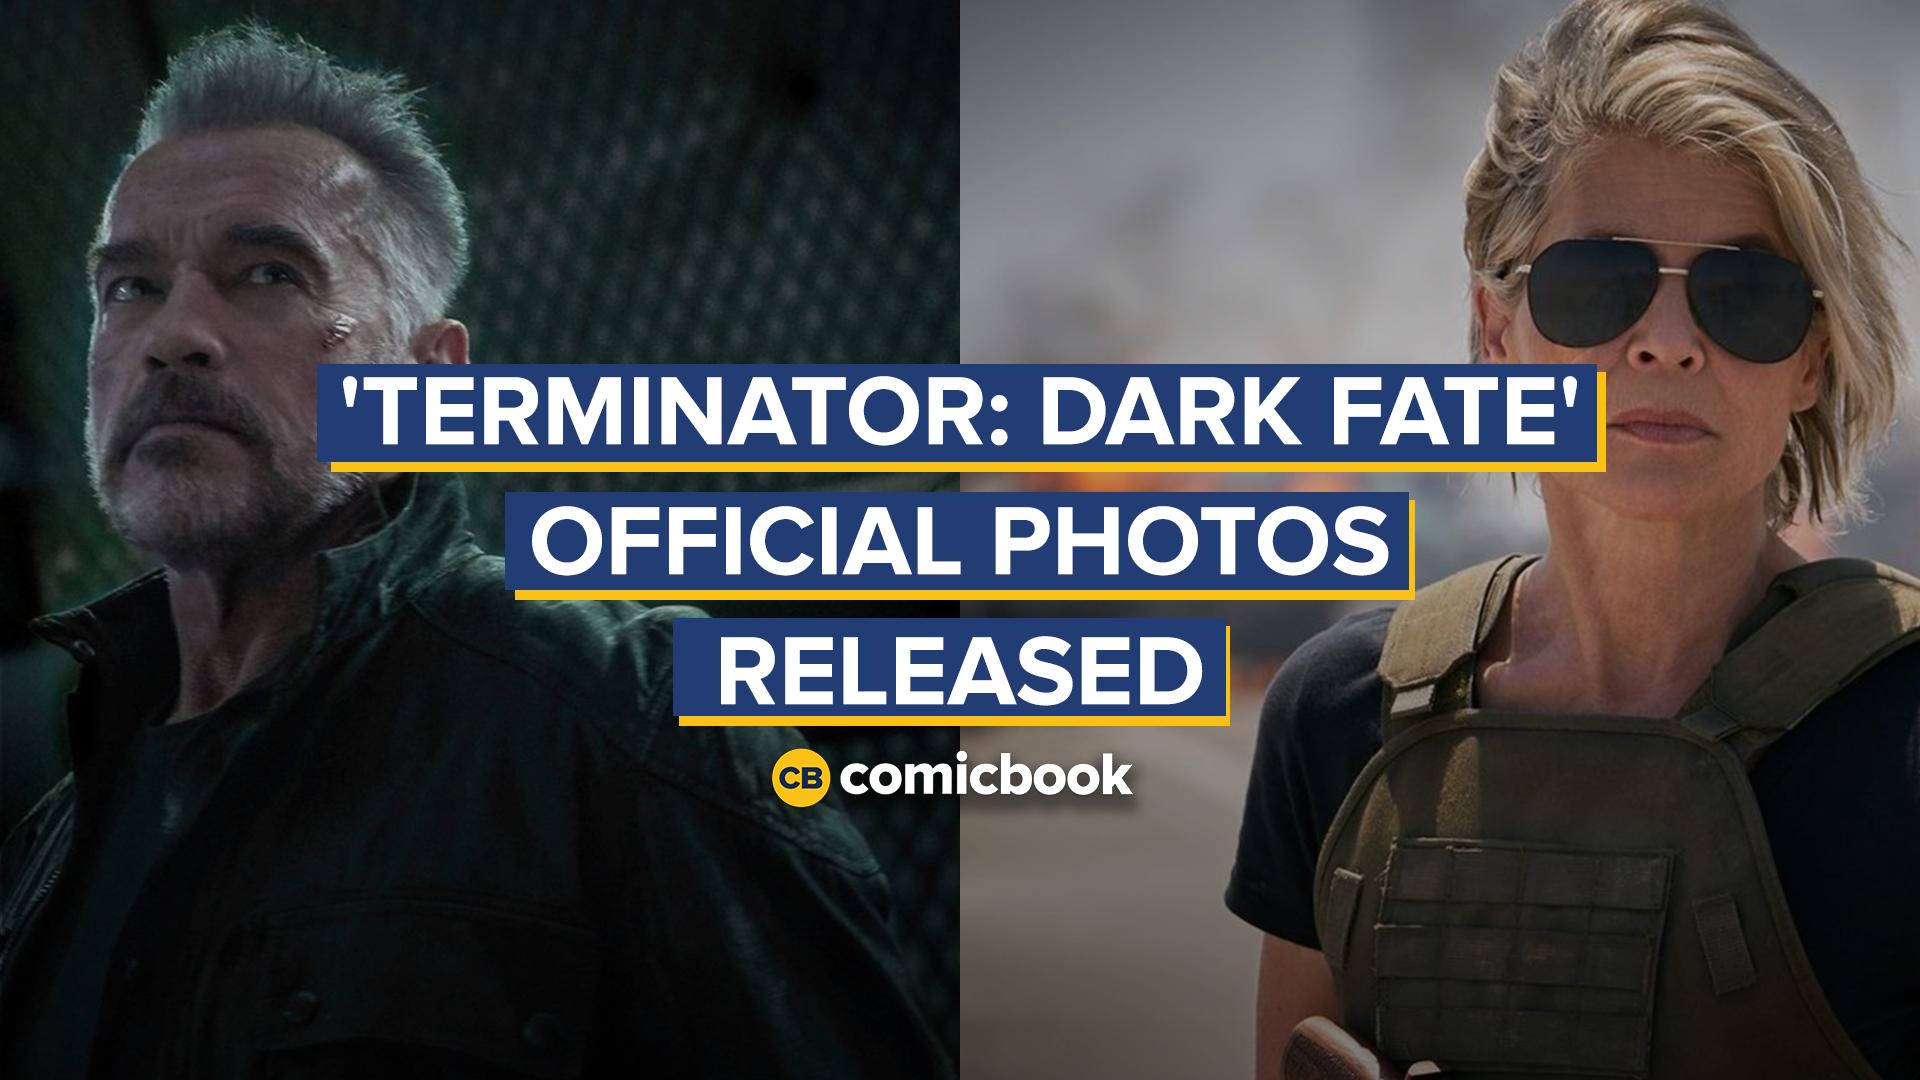 'Terminator: Dark Fate' Official Photos Released screen capture